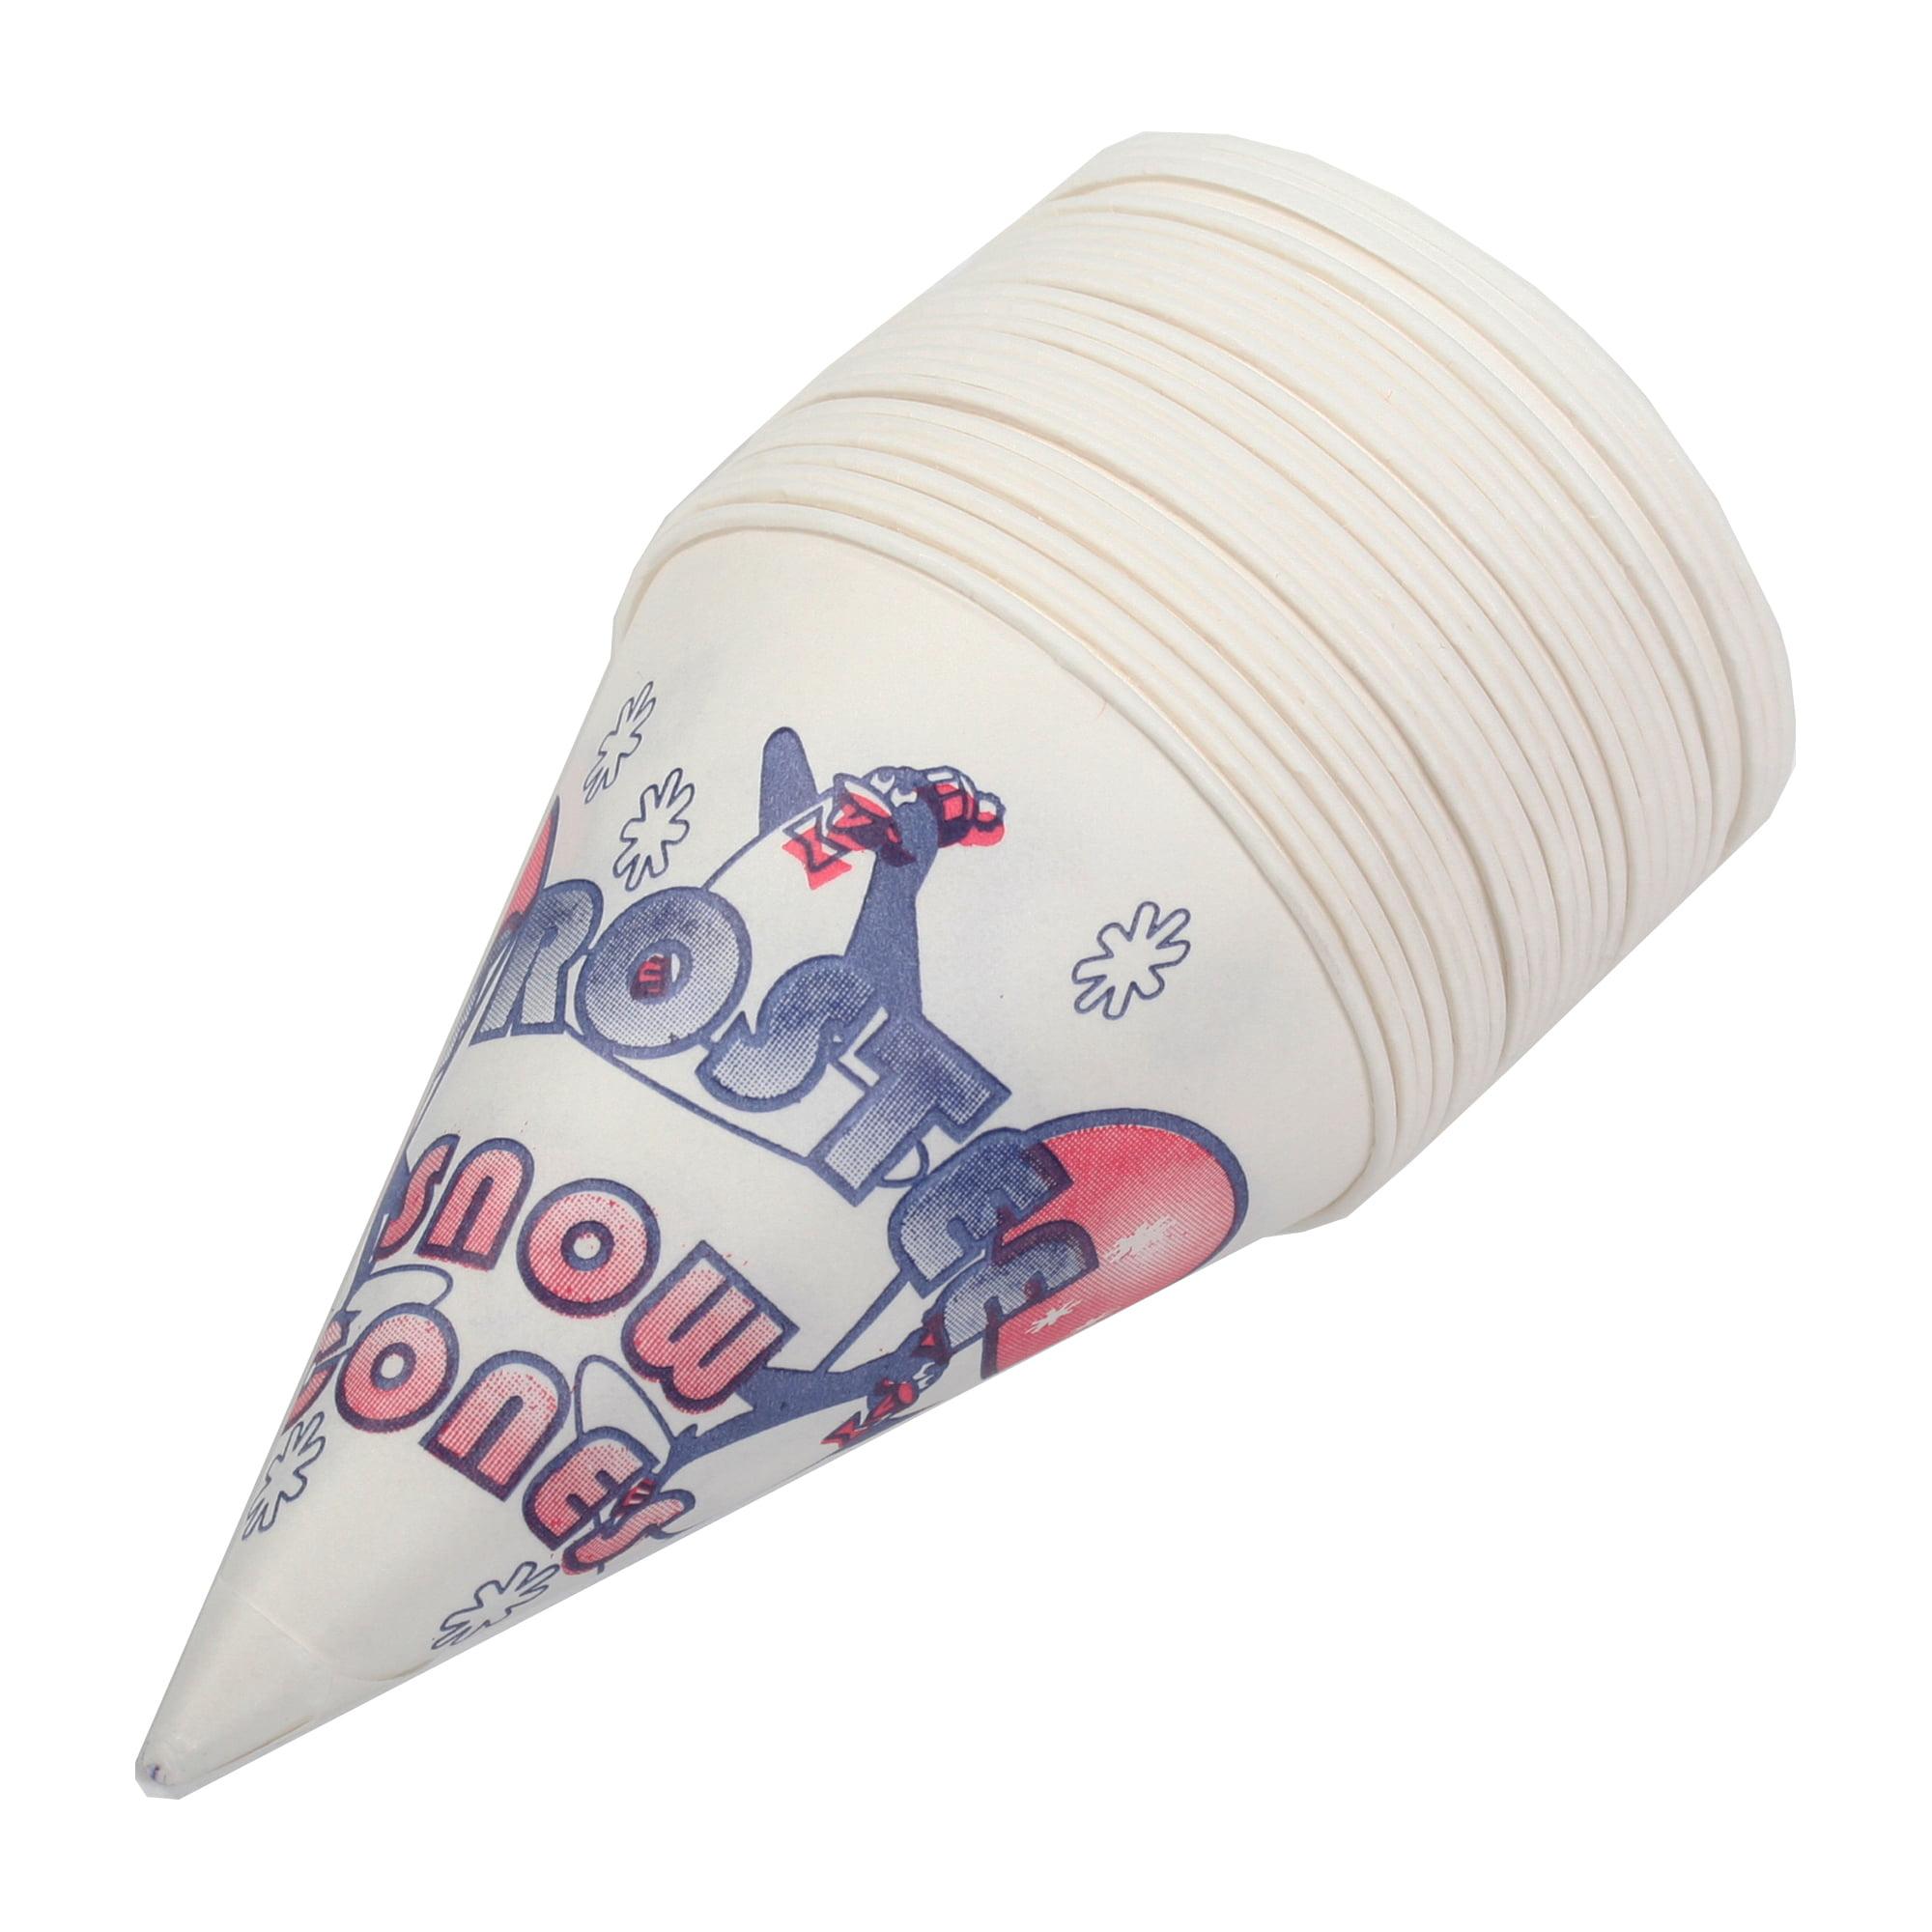 Heavy Duty 6 OZ Snow Cone Cups Sno-Kone (Box of 1000) Concession Supplies